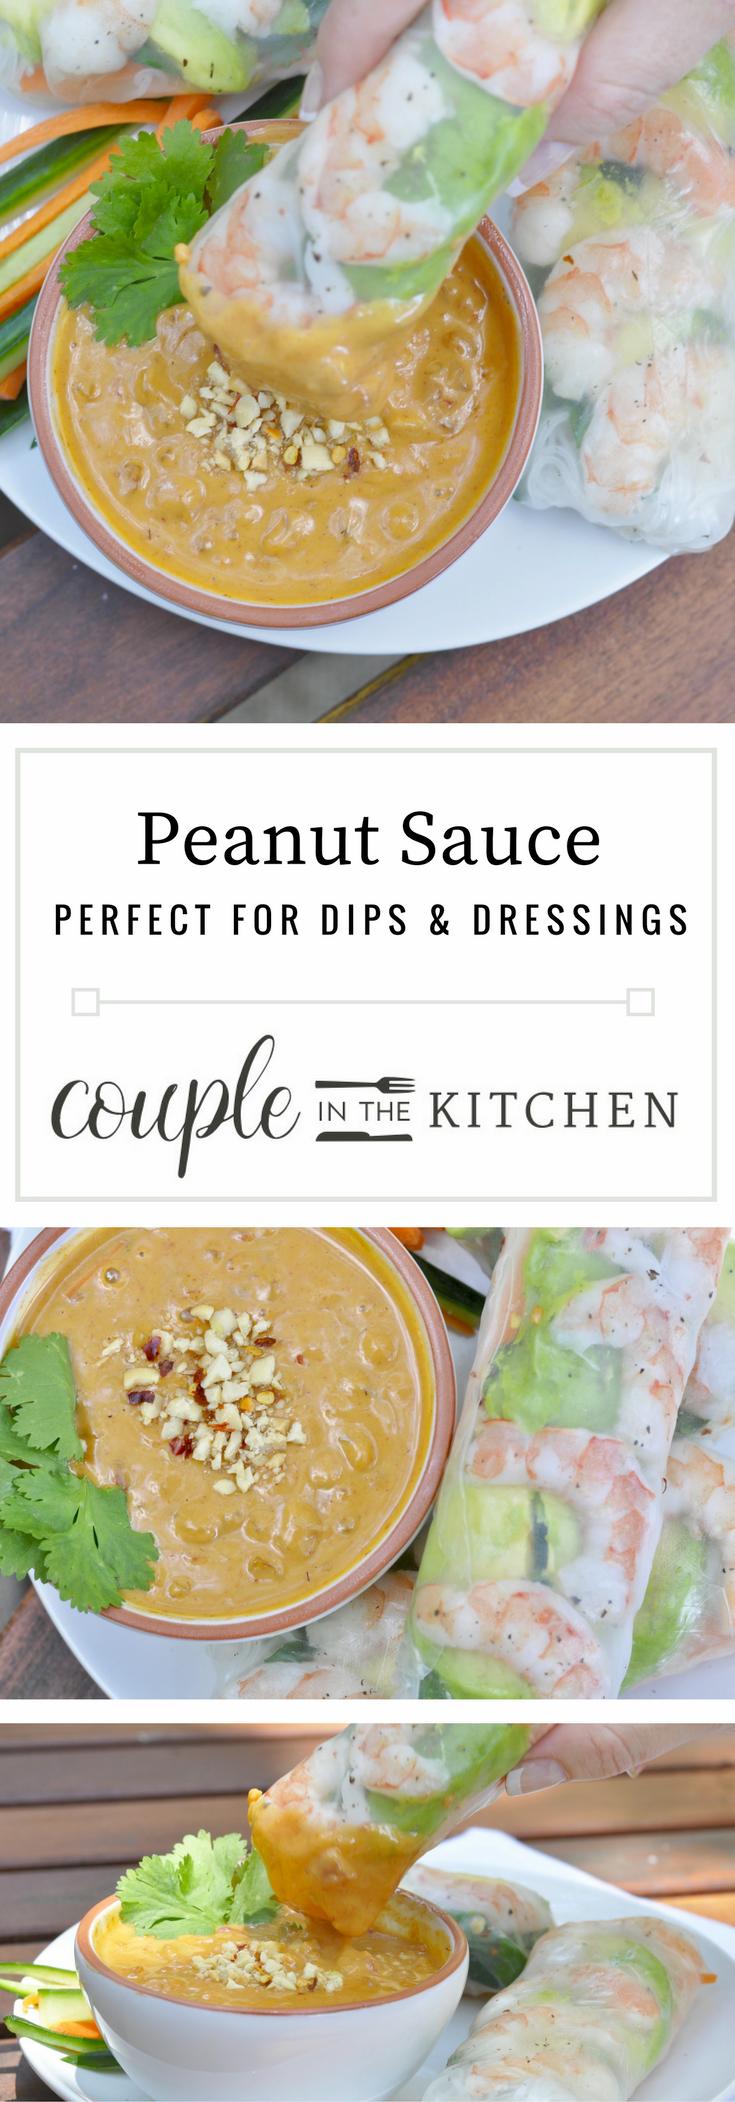 Peanut Sauce Recipe | coupleinthekitchen.com